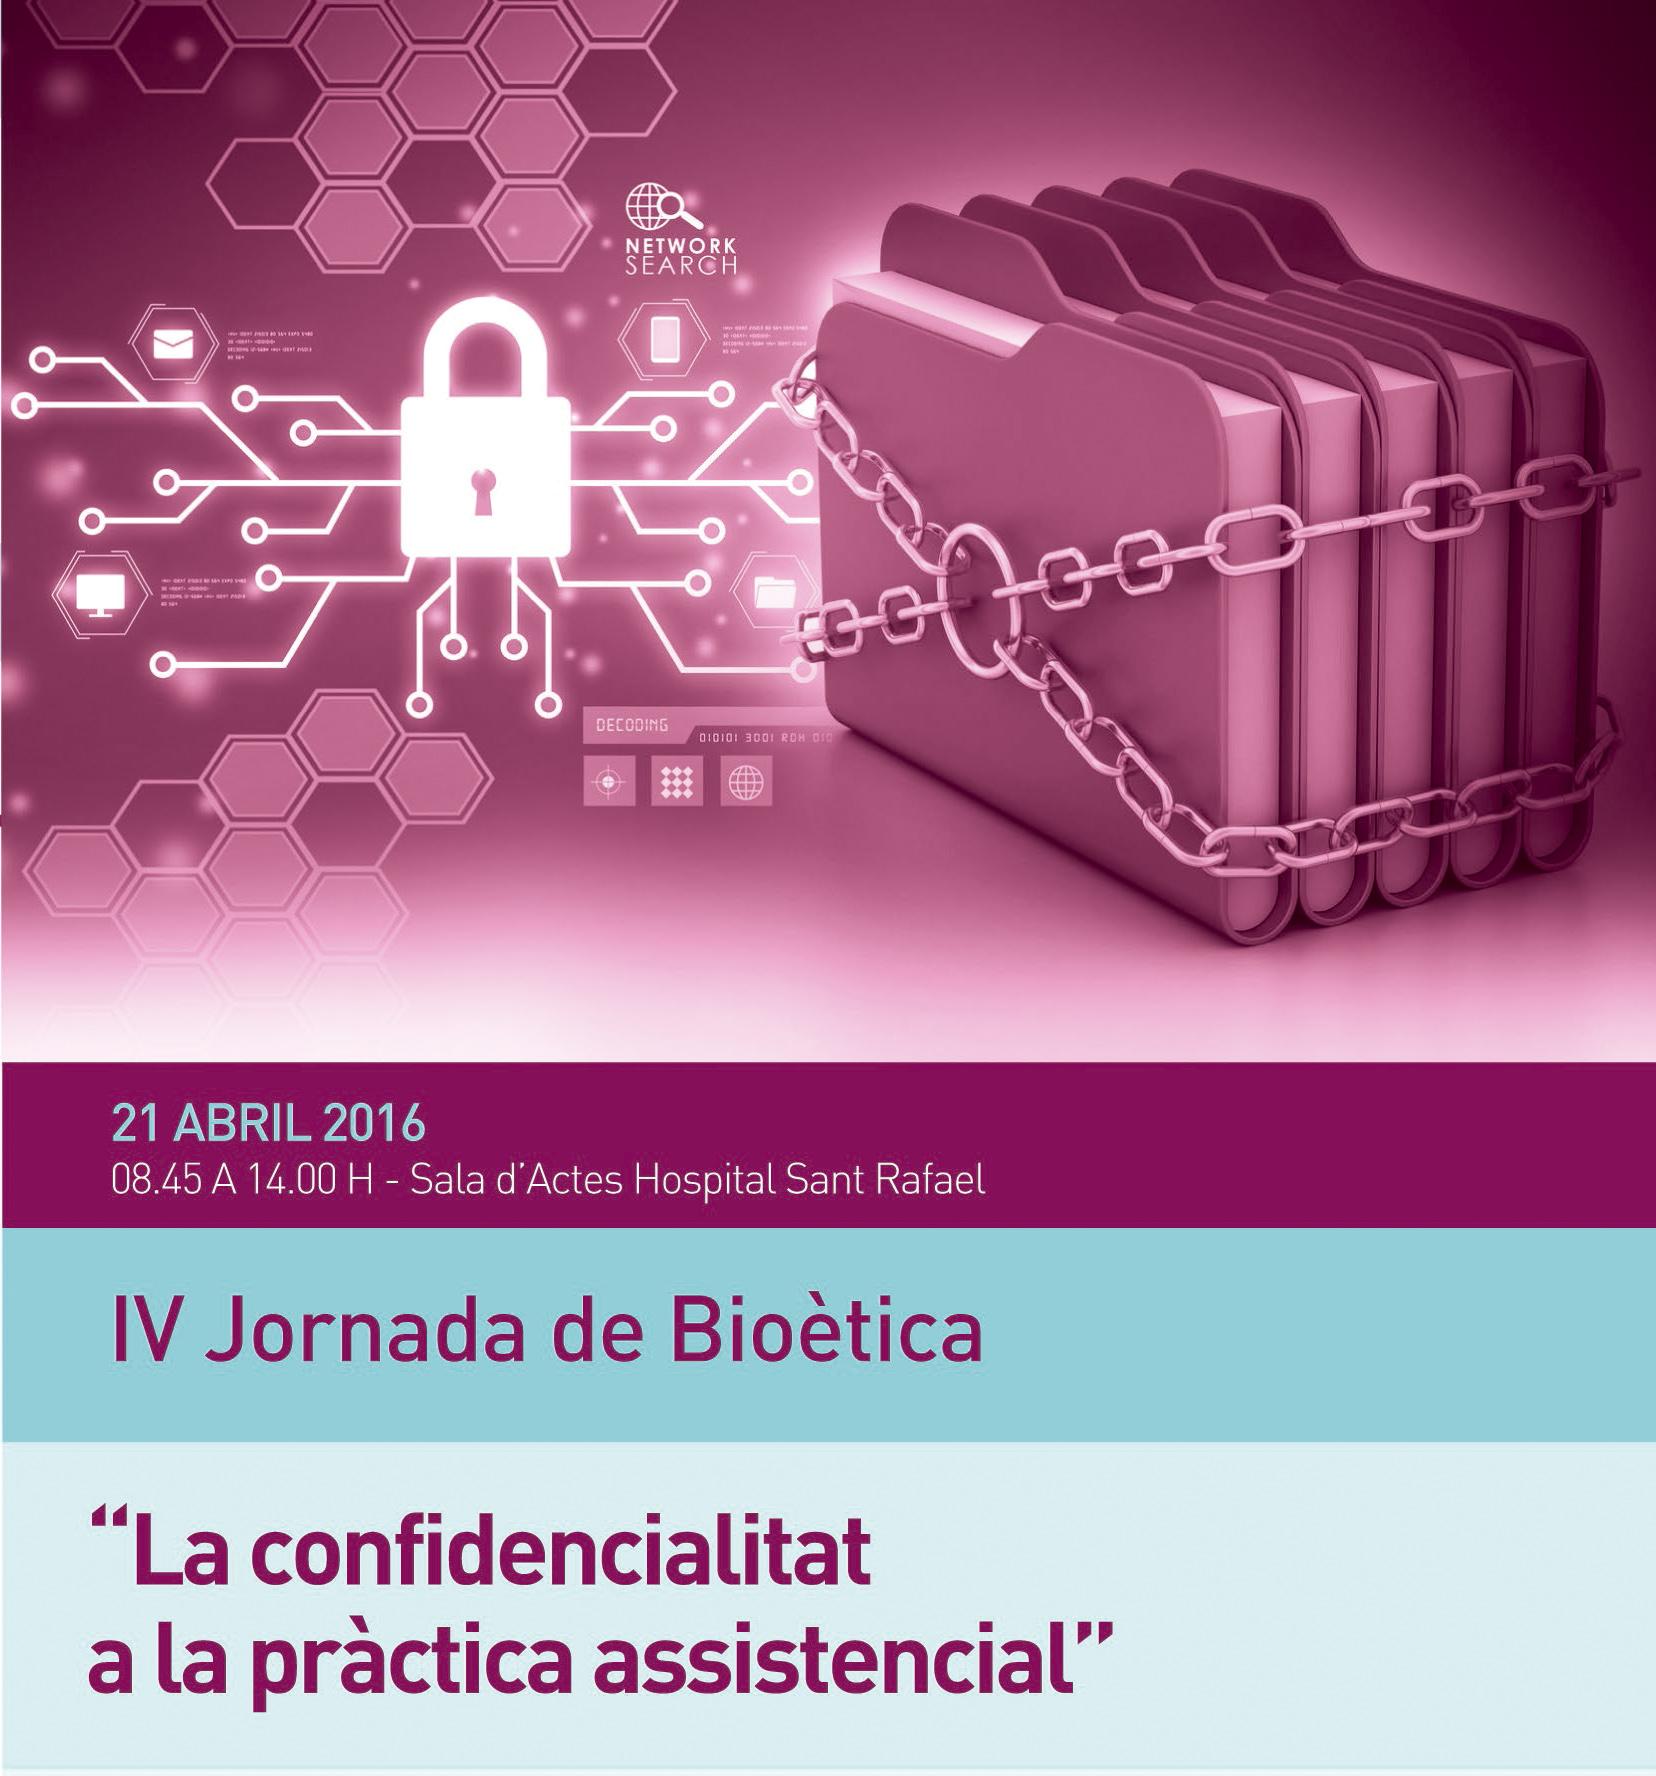 IV Jornada de Bioética (Hospital Sant Rafael HHSCJ)